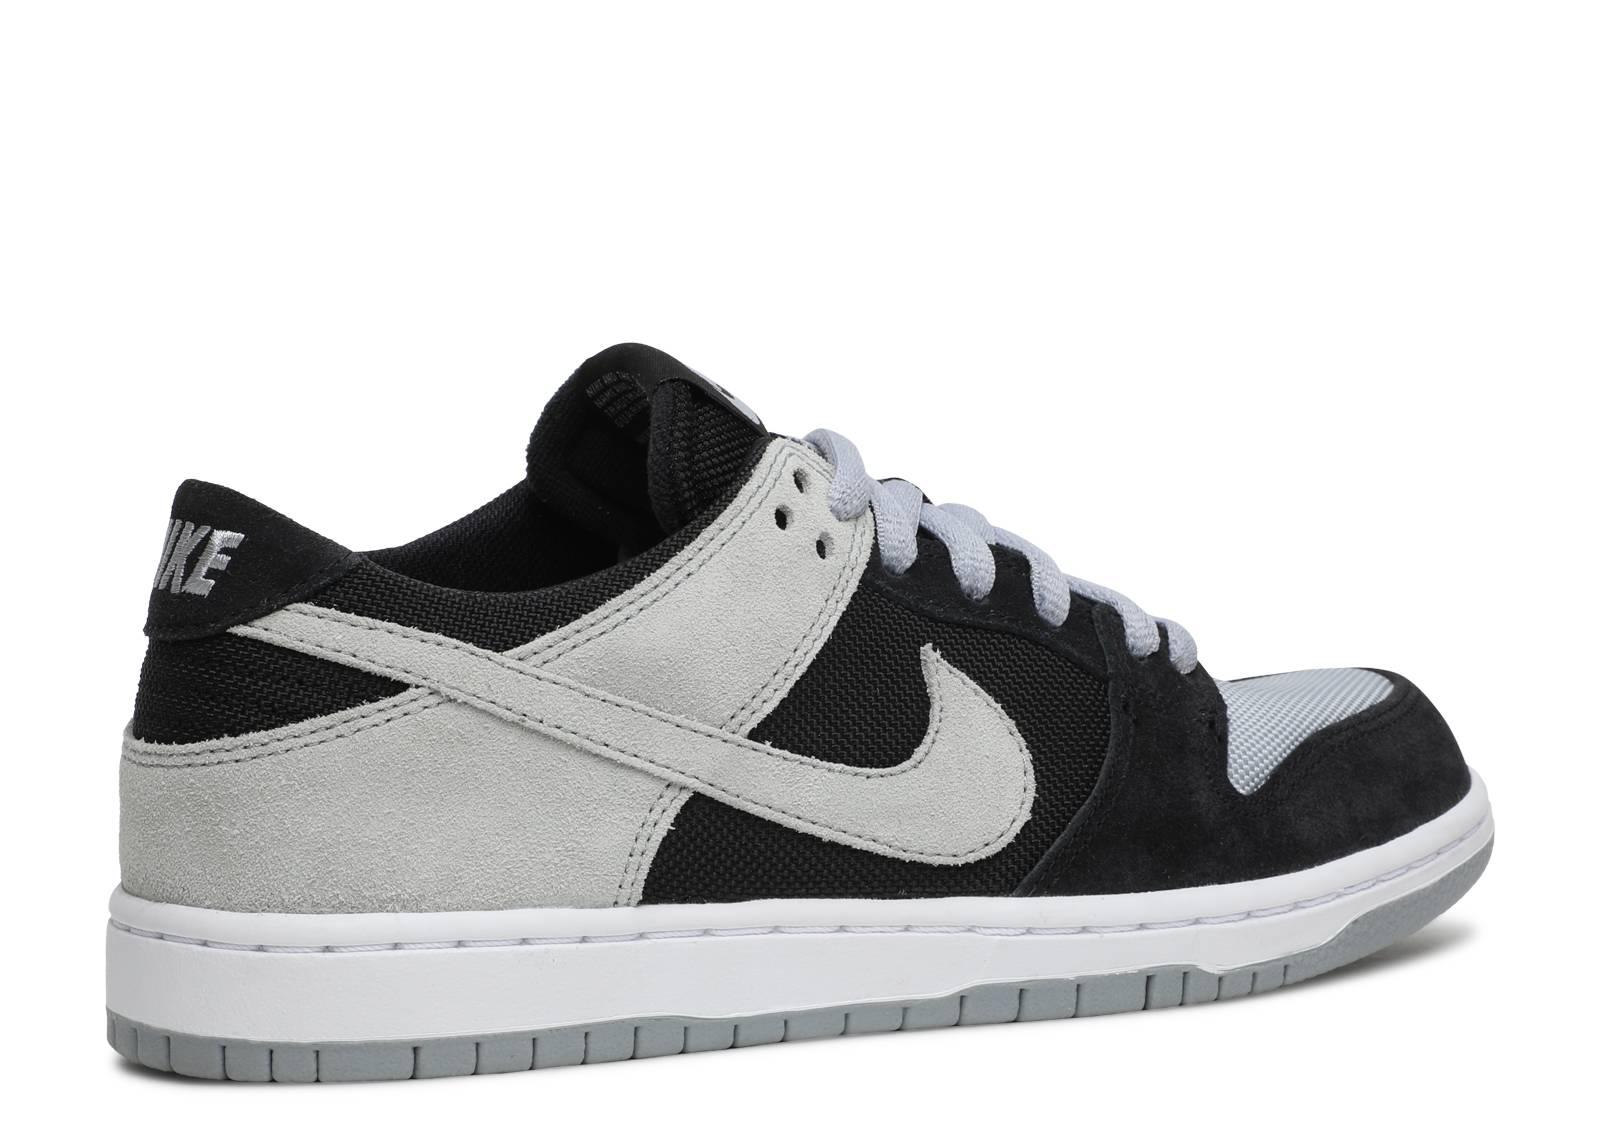 d8877509b704 Nike Sb Zoom Dunk Low Pro - Nike - 854866 001 - black wolf grey-white-white